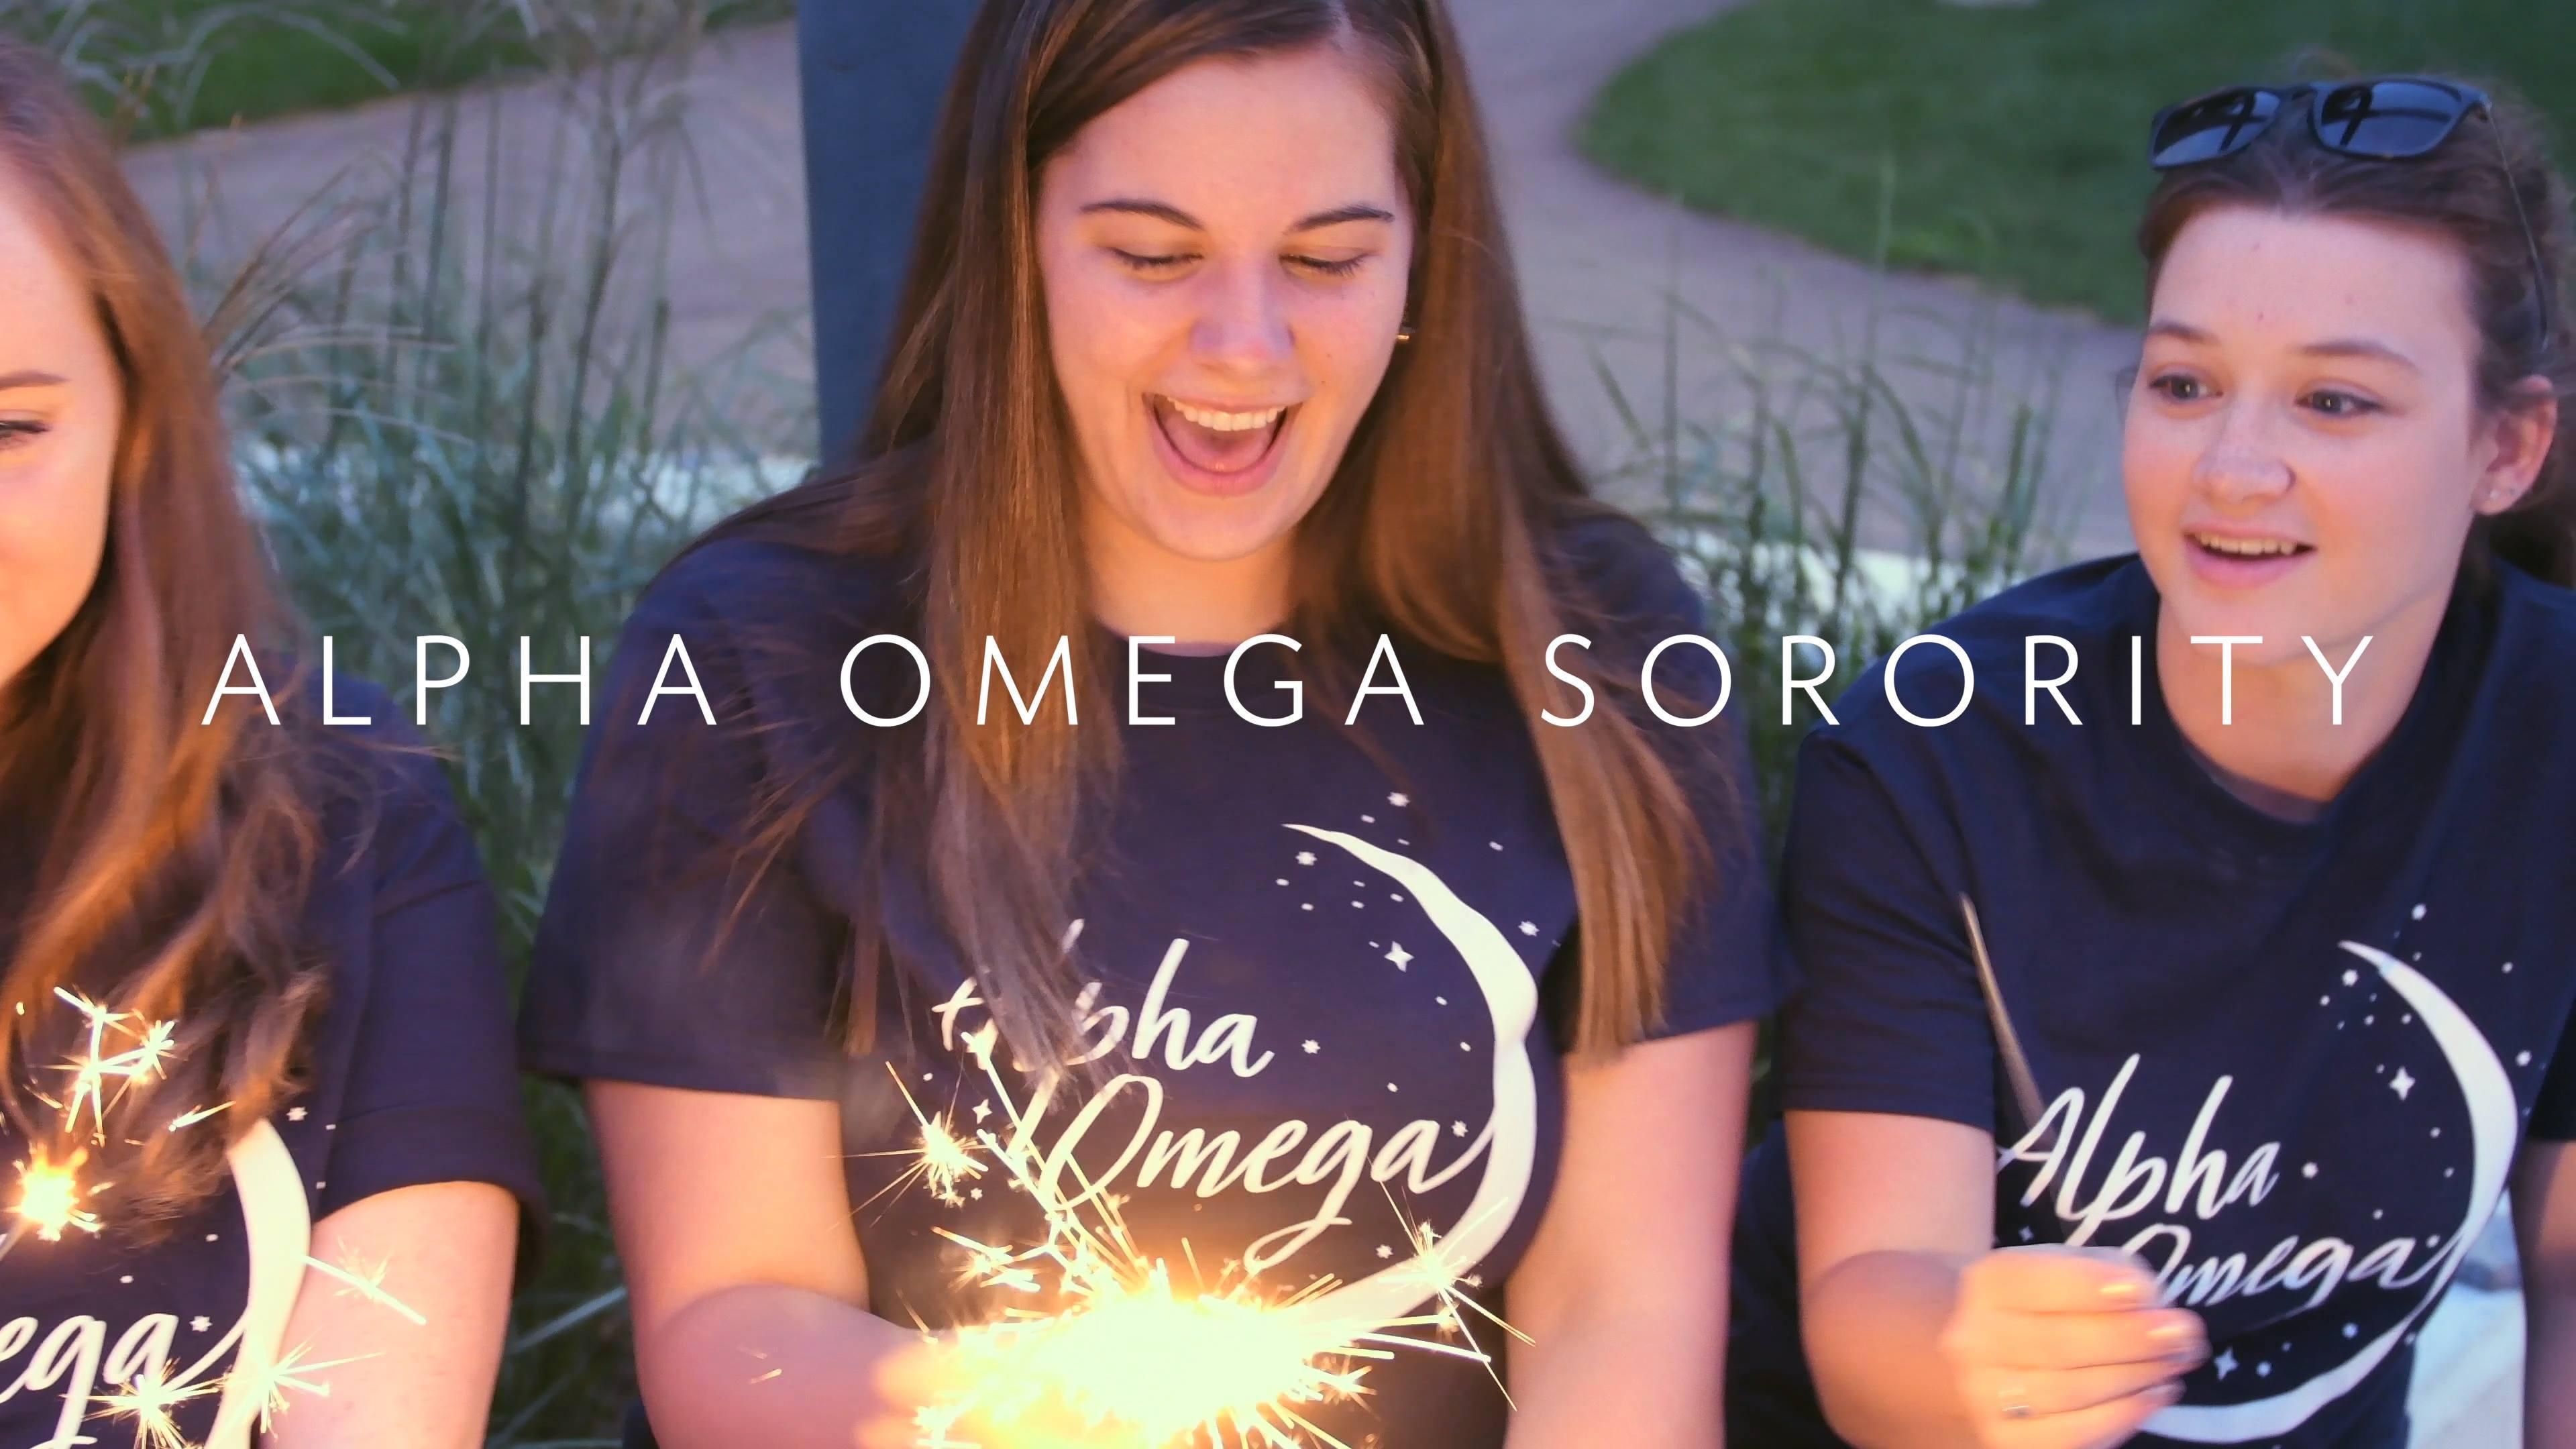 Alpha Omega Sorority Recruitment 2018/19